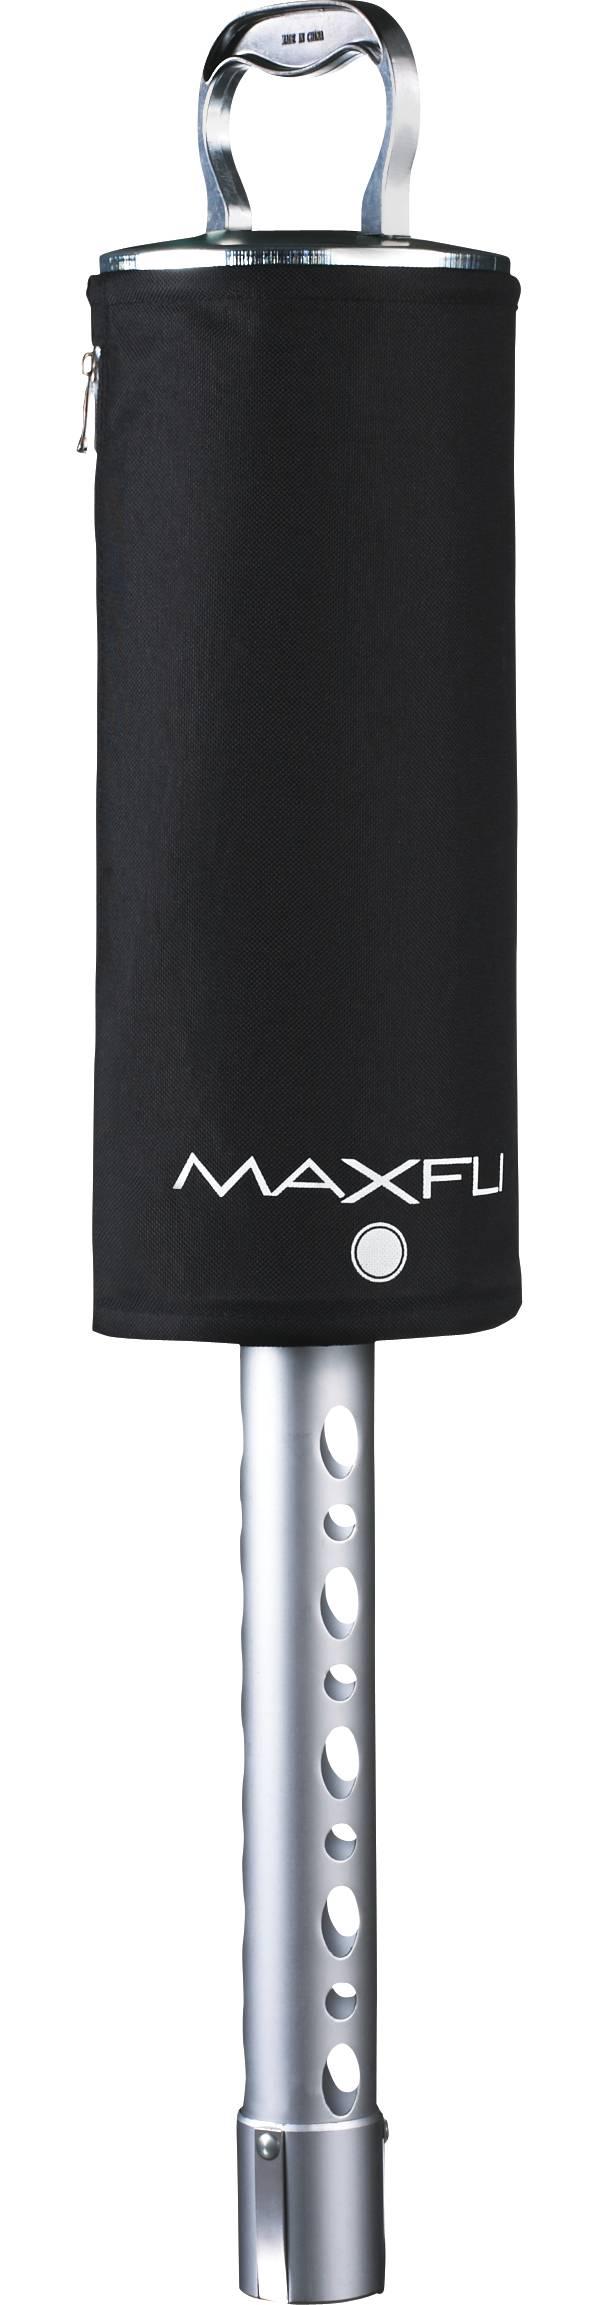 Maxfli Deluxe Shag Bag product image